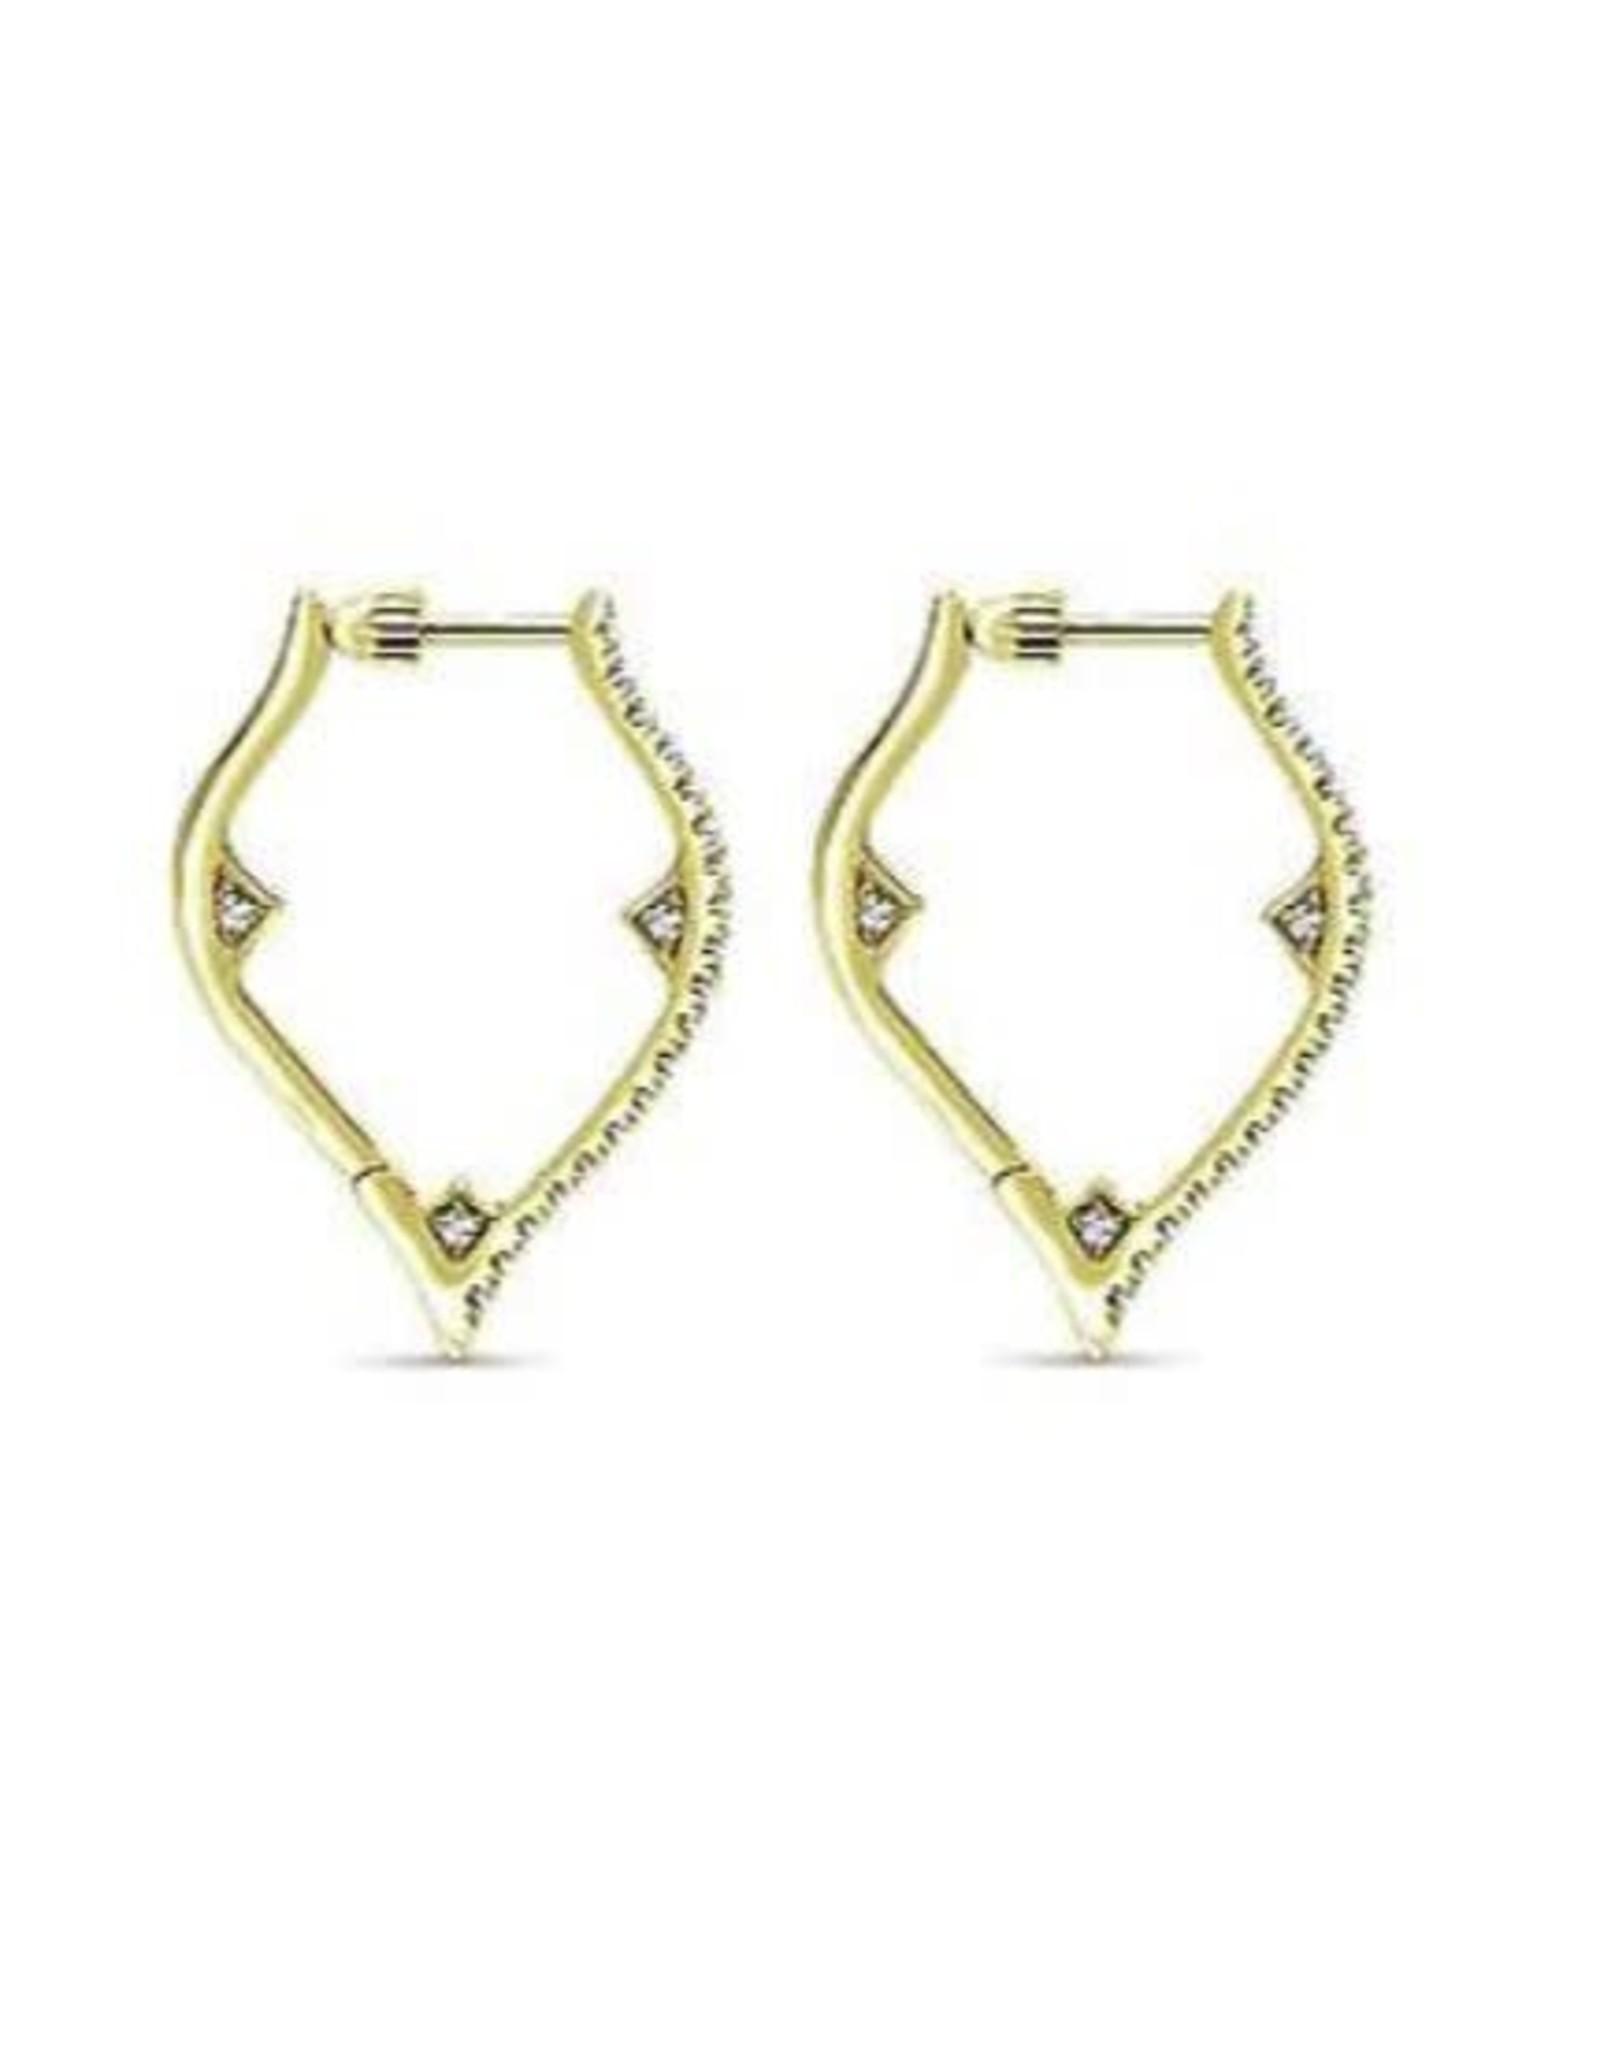 14K Yellow Gold Diamond Hoop Earrings with Screw Backs, D: 0.52ct